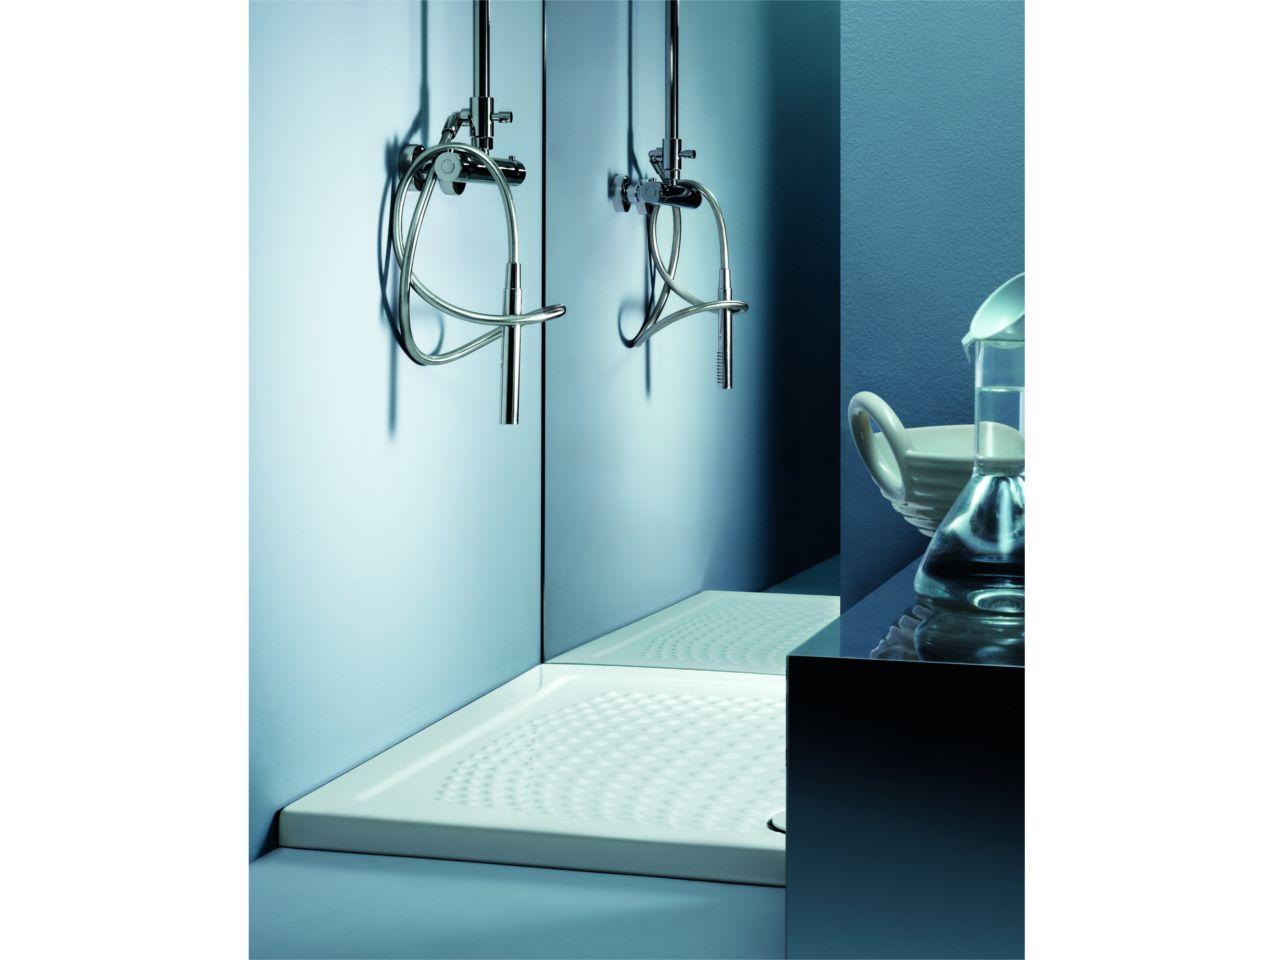 Piatto doccia energy 80x100xh3 5 bianco venduto da for Doccia iperceramica